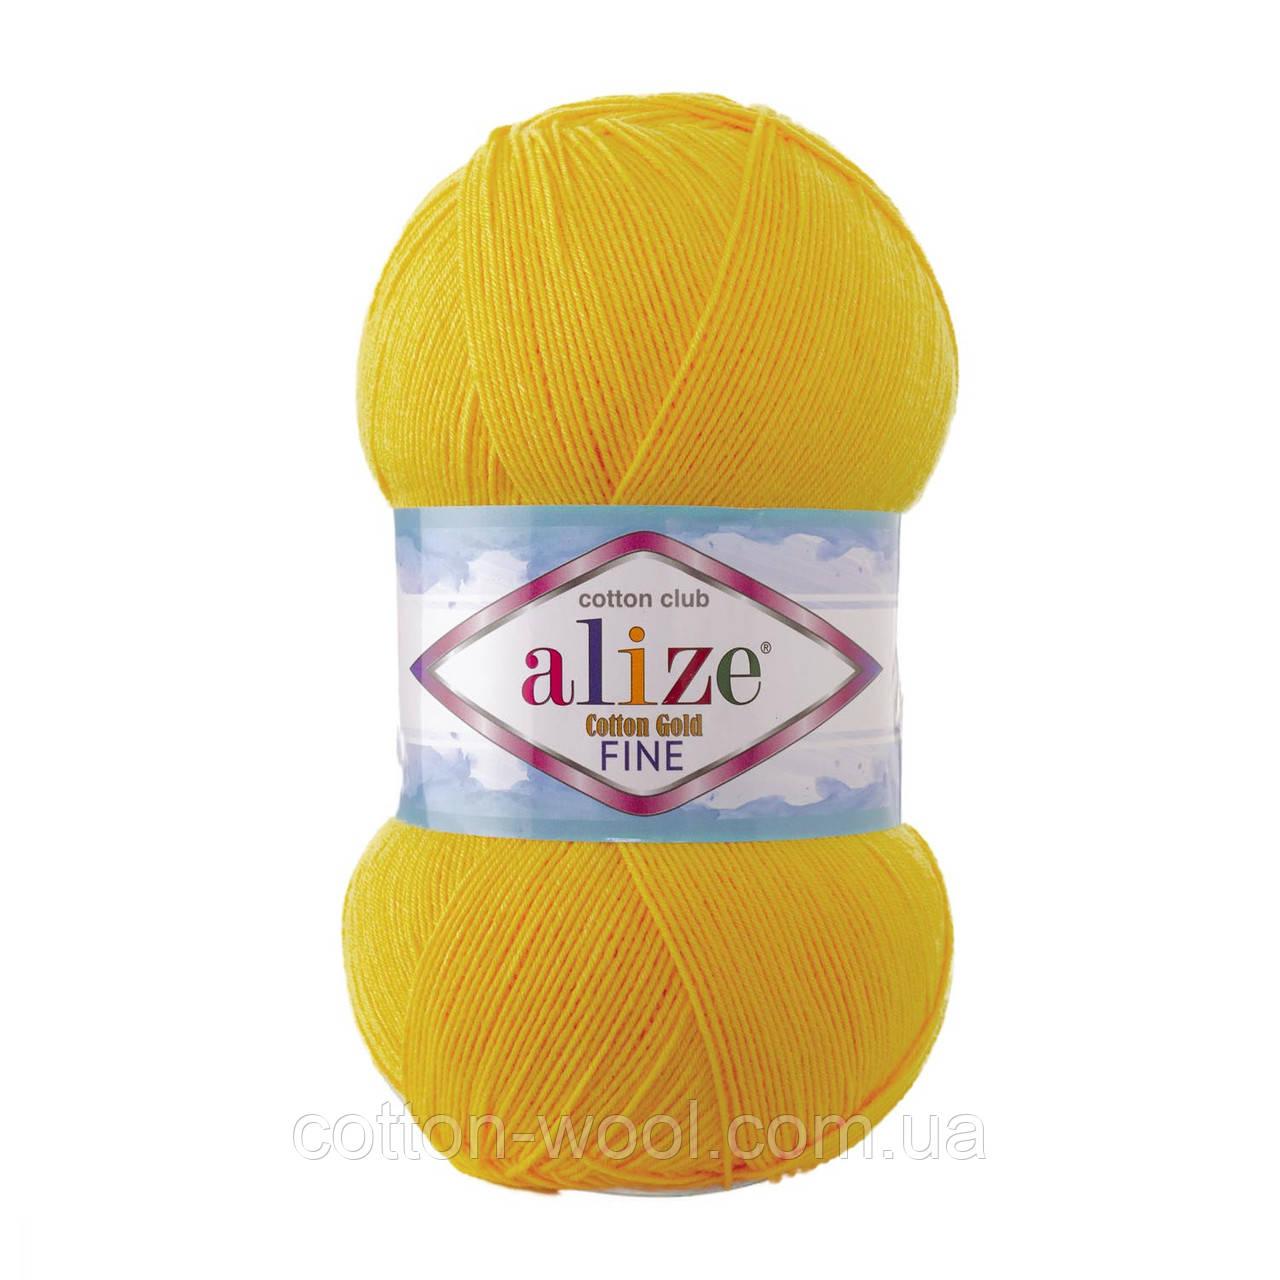 Alize Cotton  Gold Fine (Коттон Голд Файн) 55% - бавовна, 45% - акріл 216